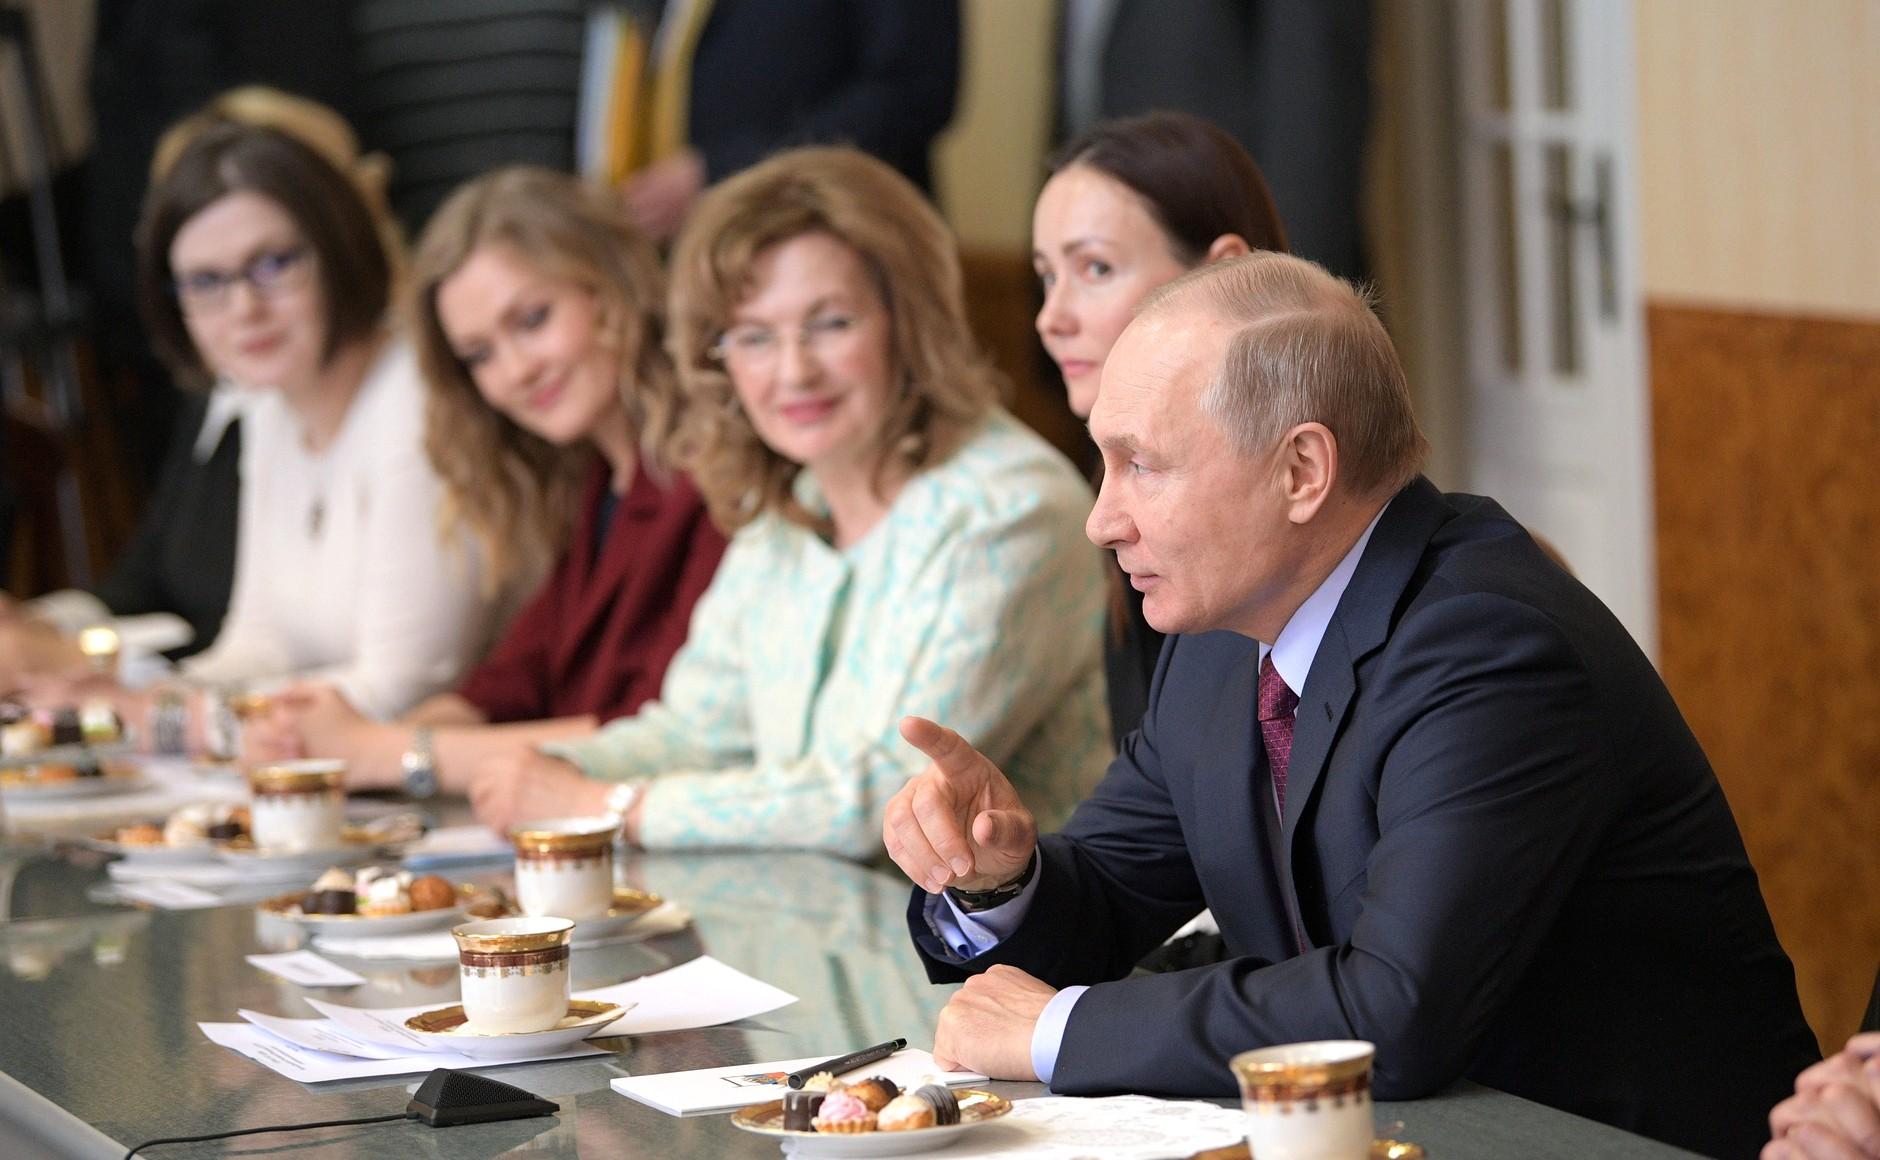 В канун 8 Марта Владимир Путин встретился в Самаре с ...